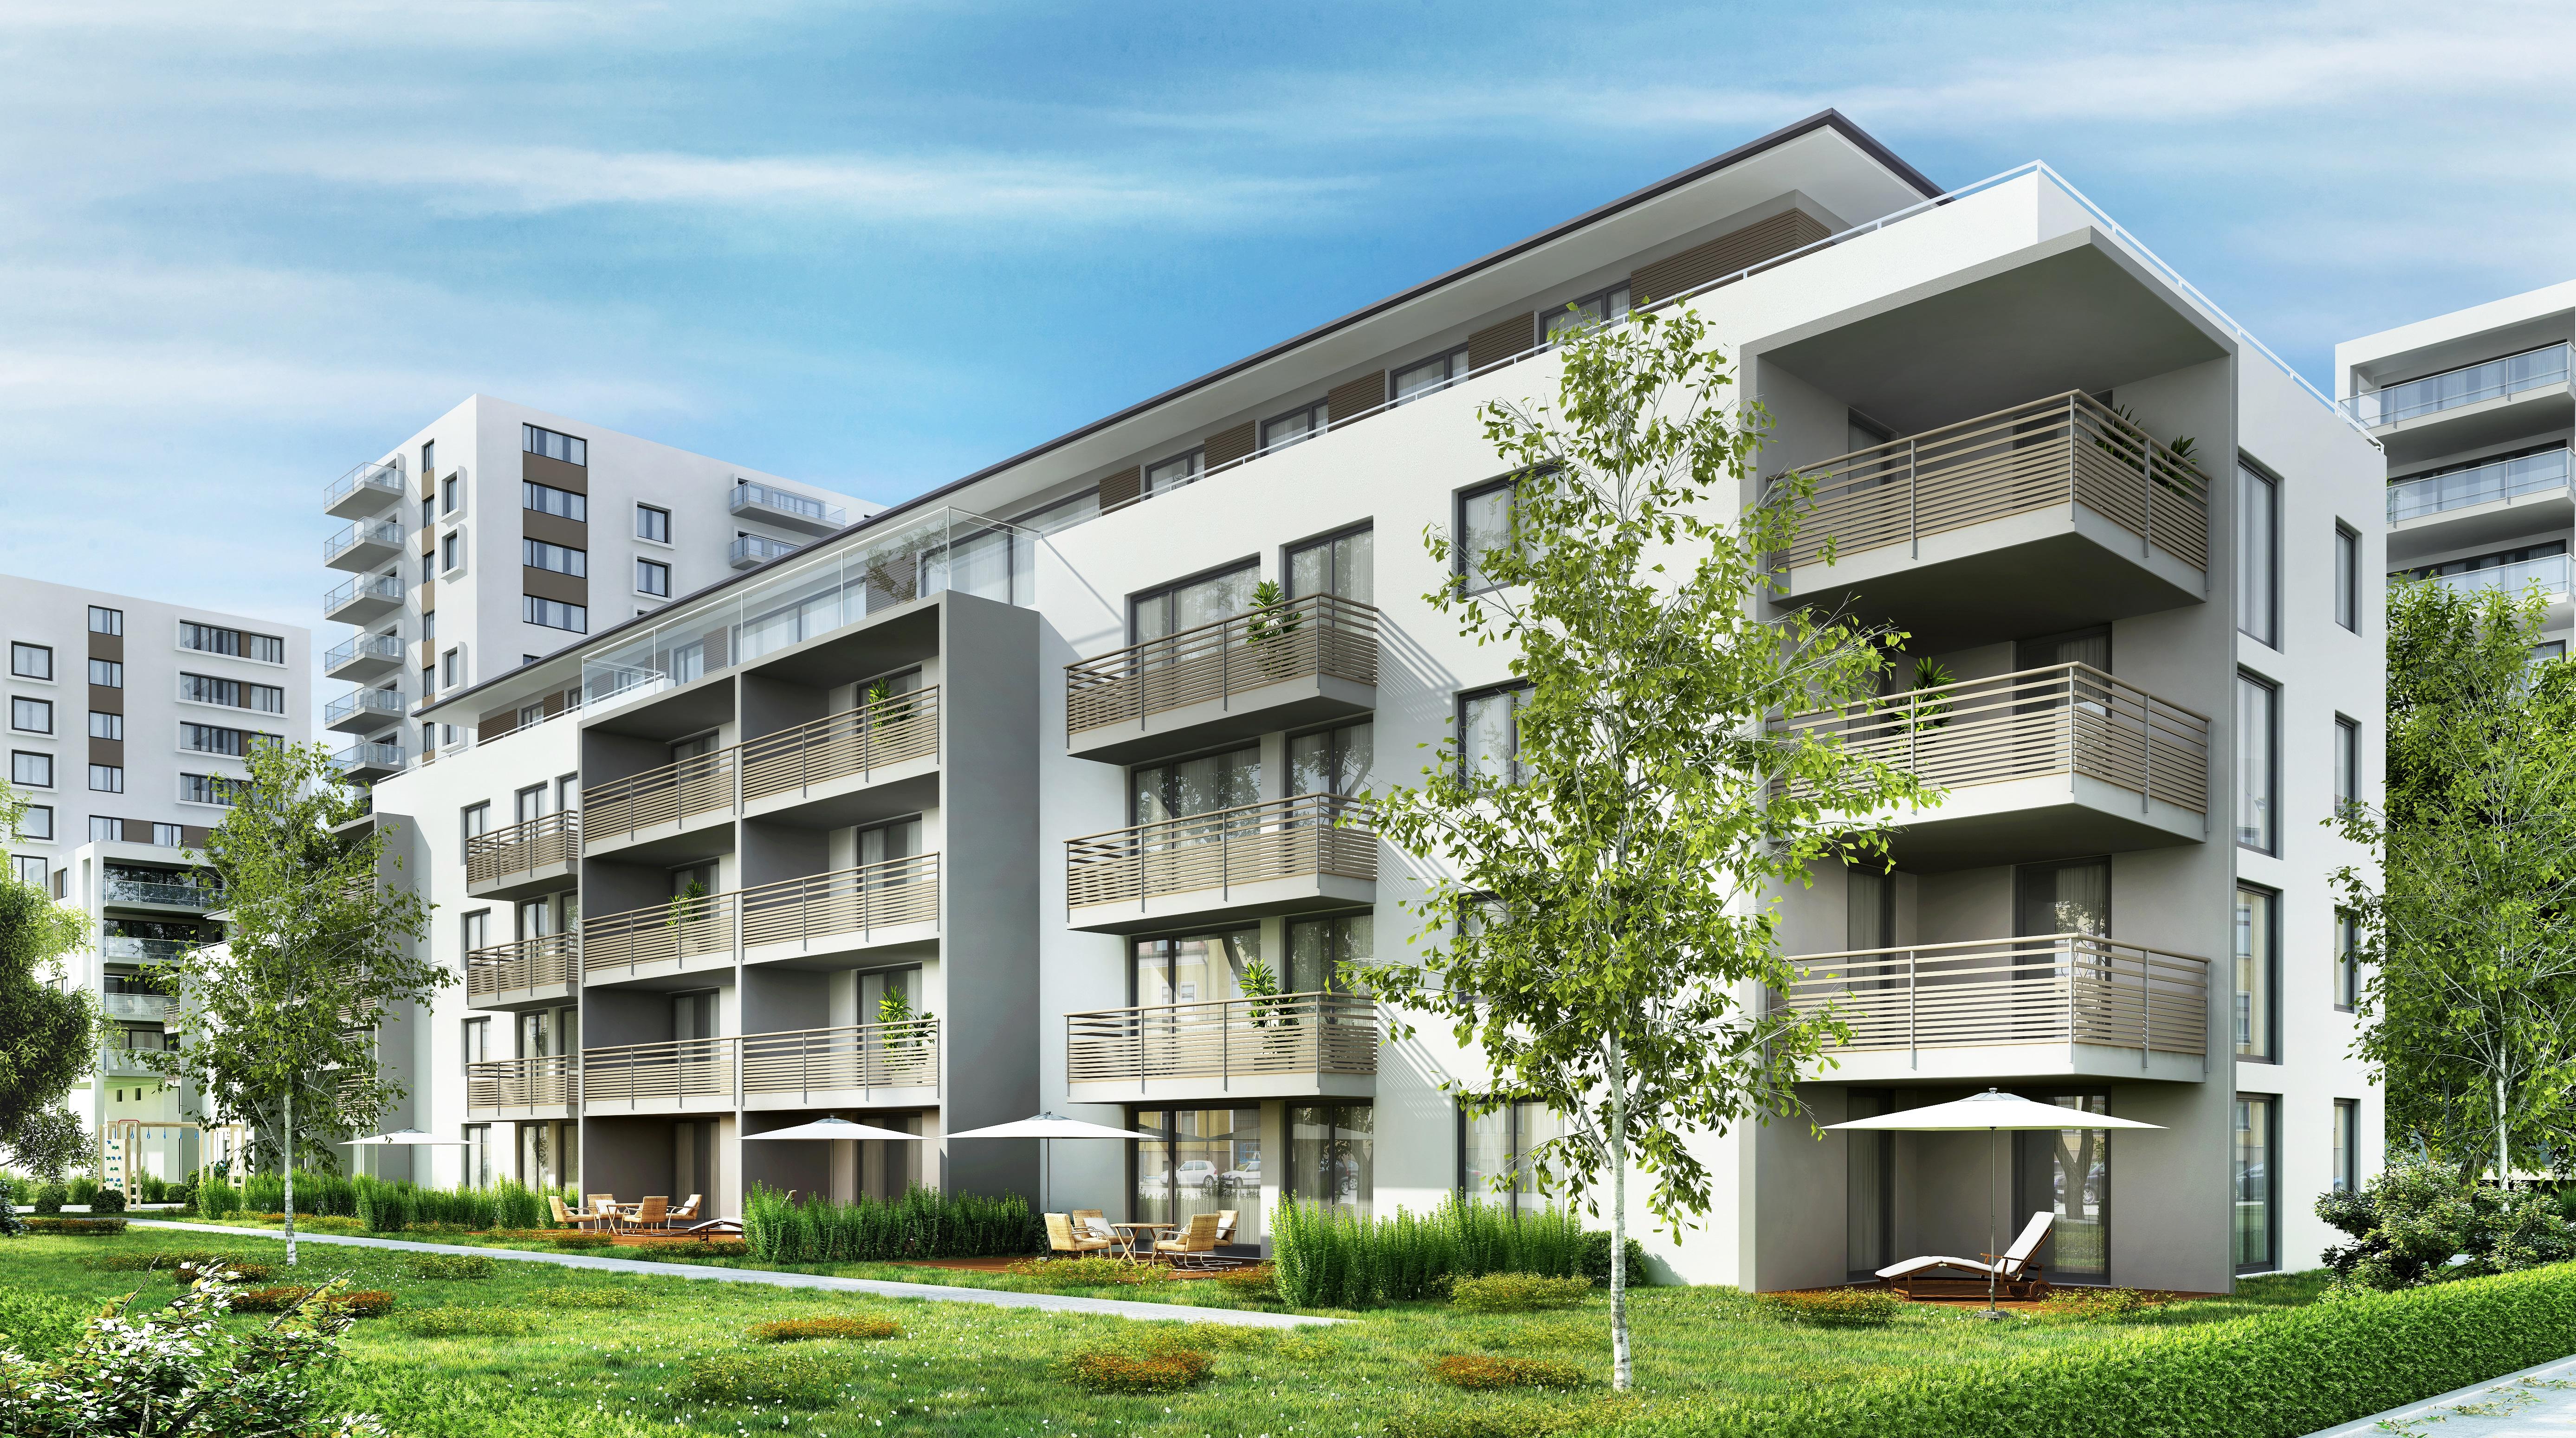 Residential rental property